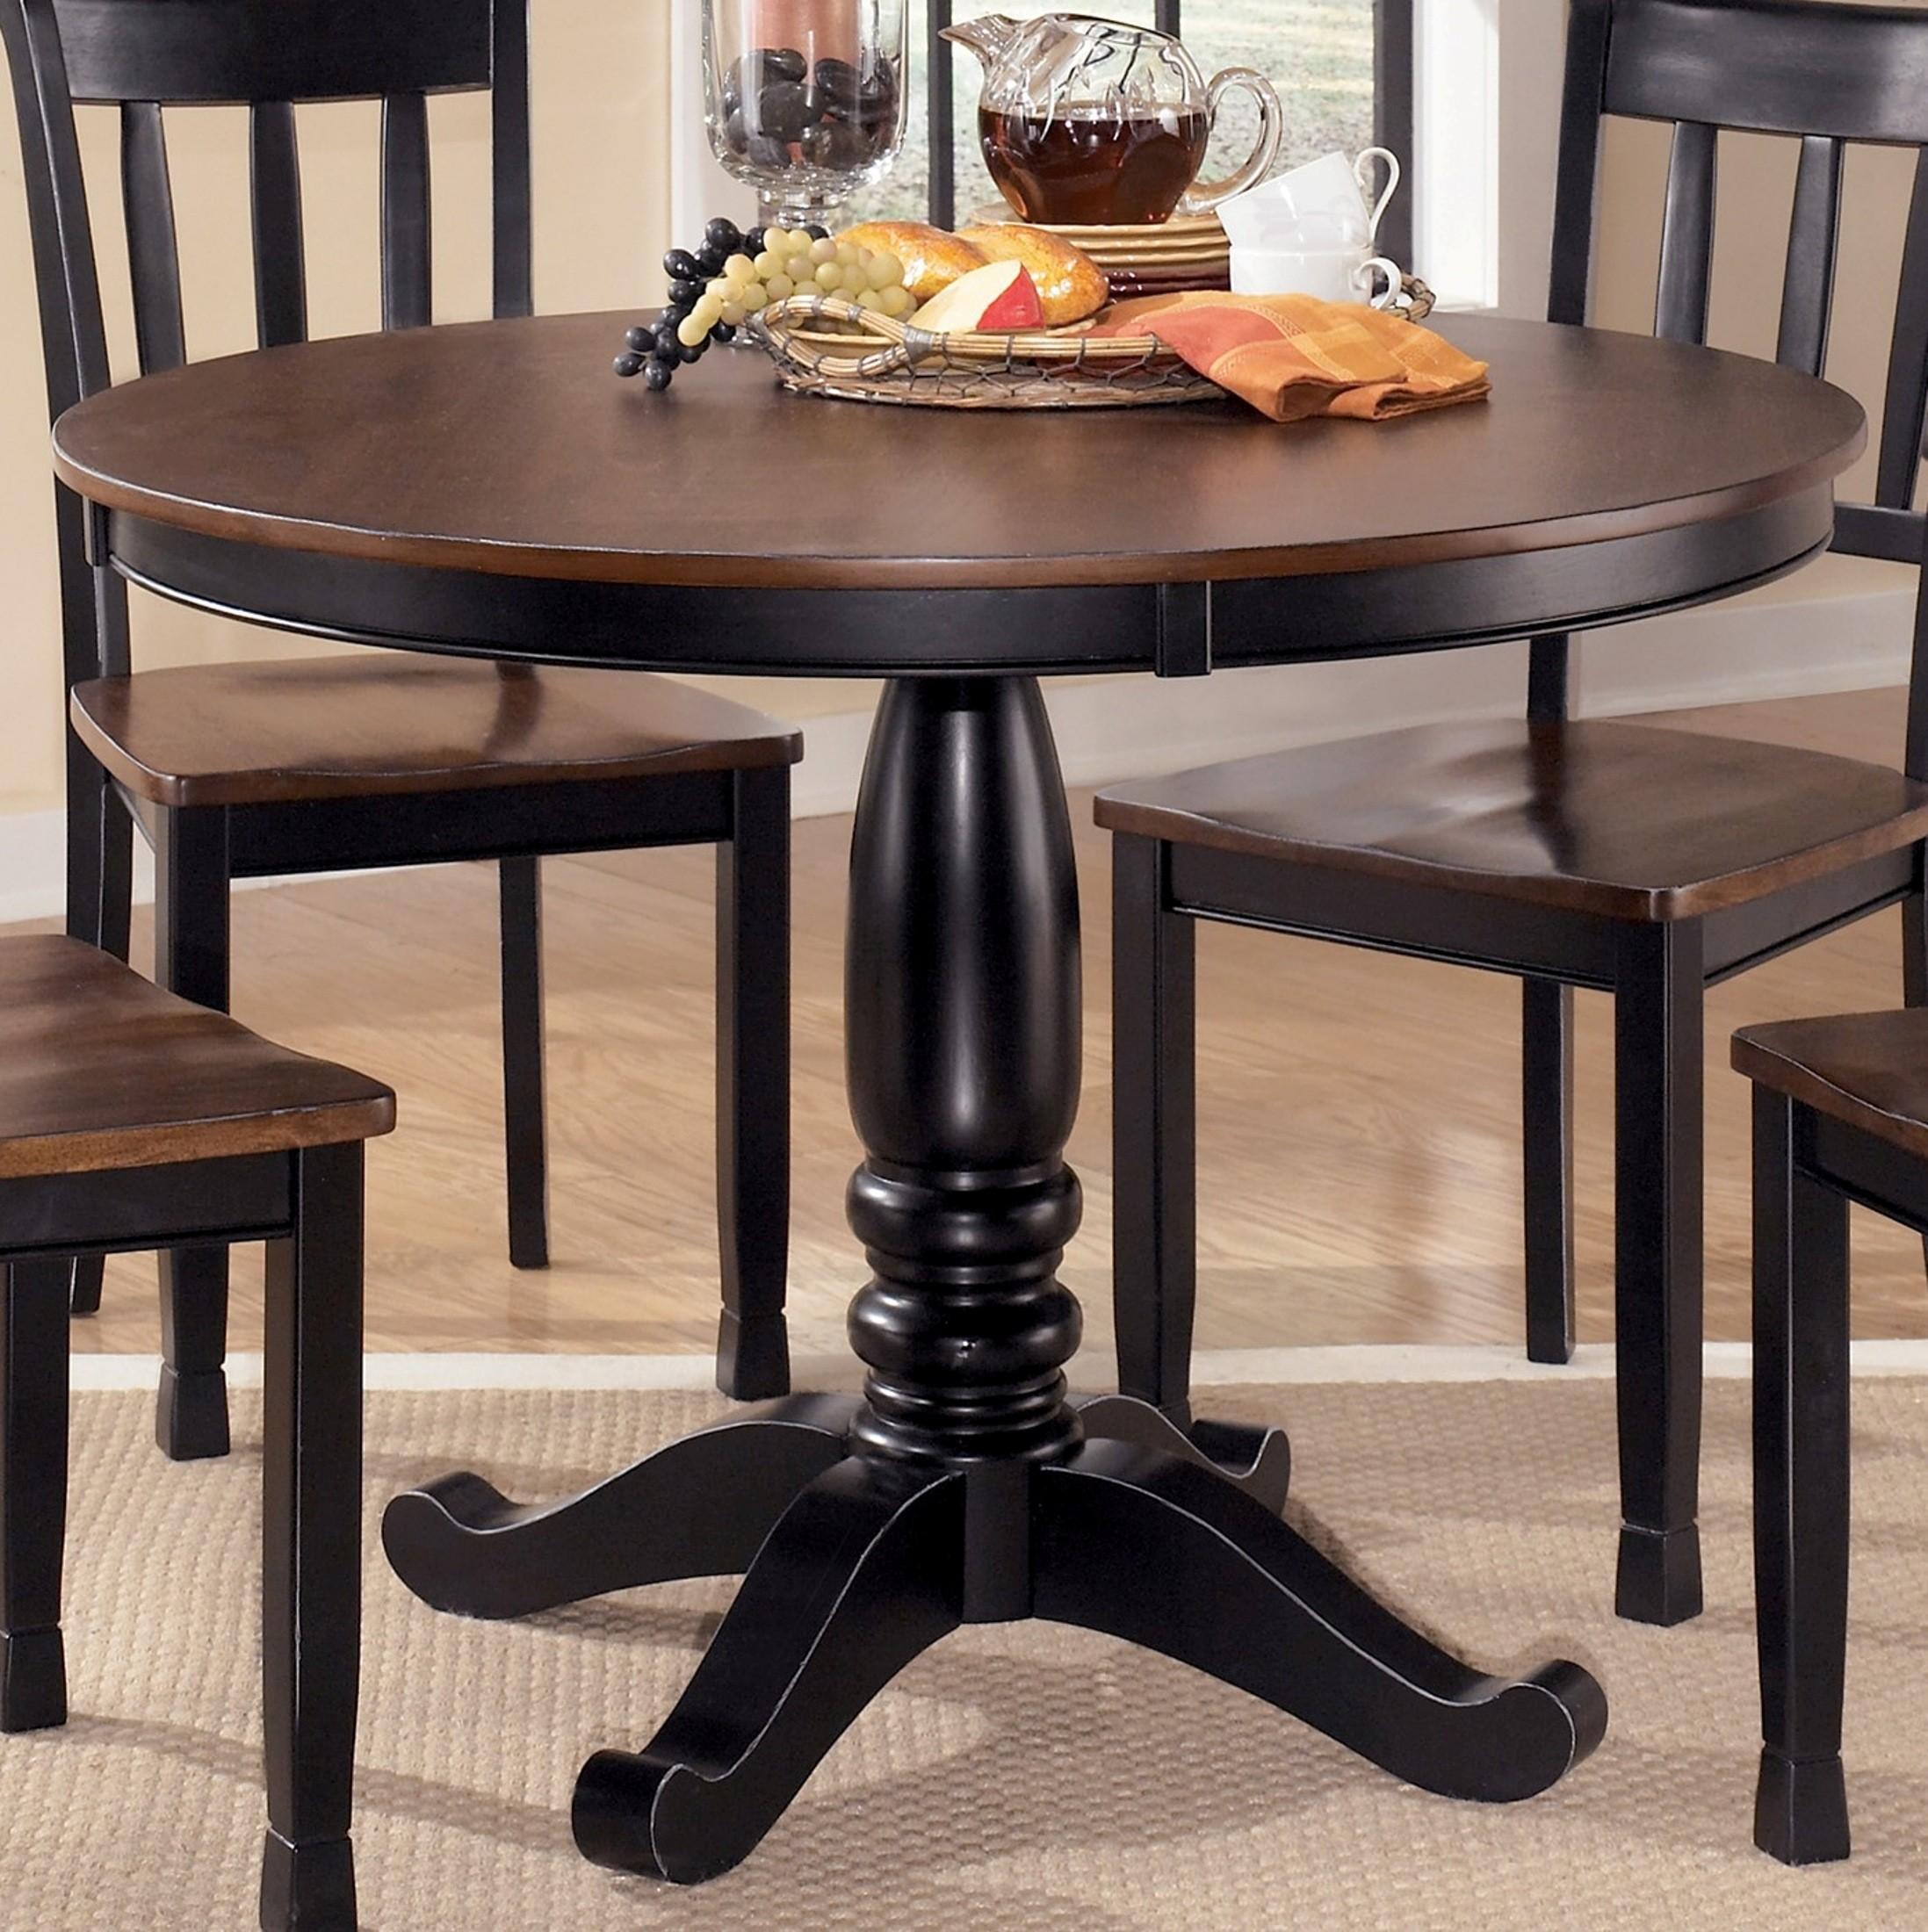 Amazing Round Dining Room Tables 2195 x 2200 · 836 kB · jpeg